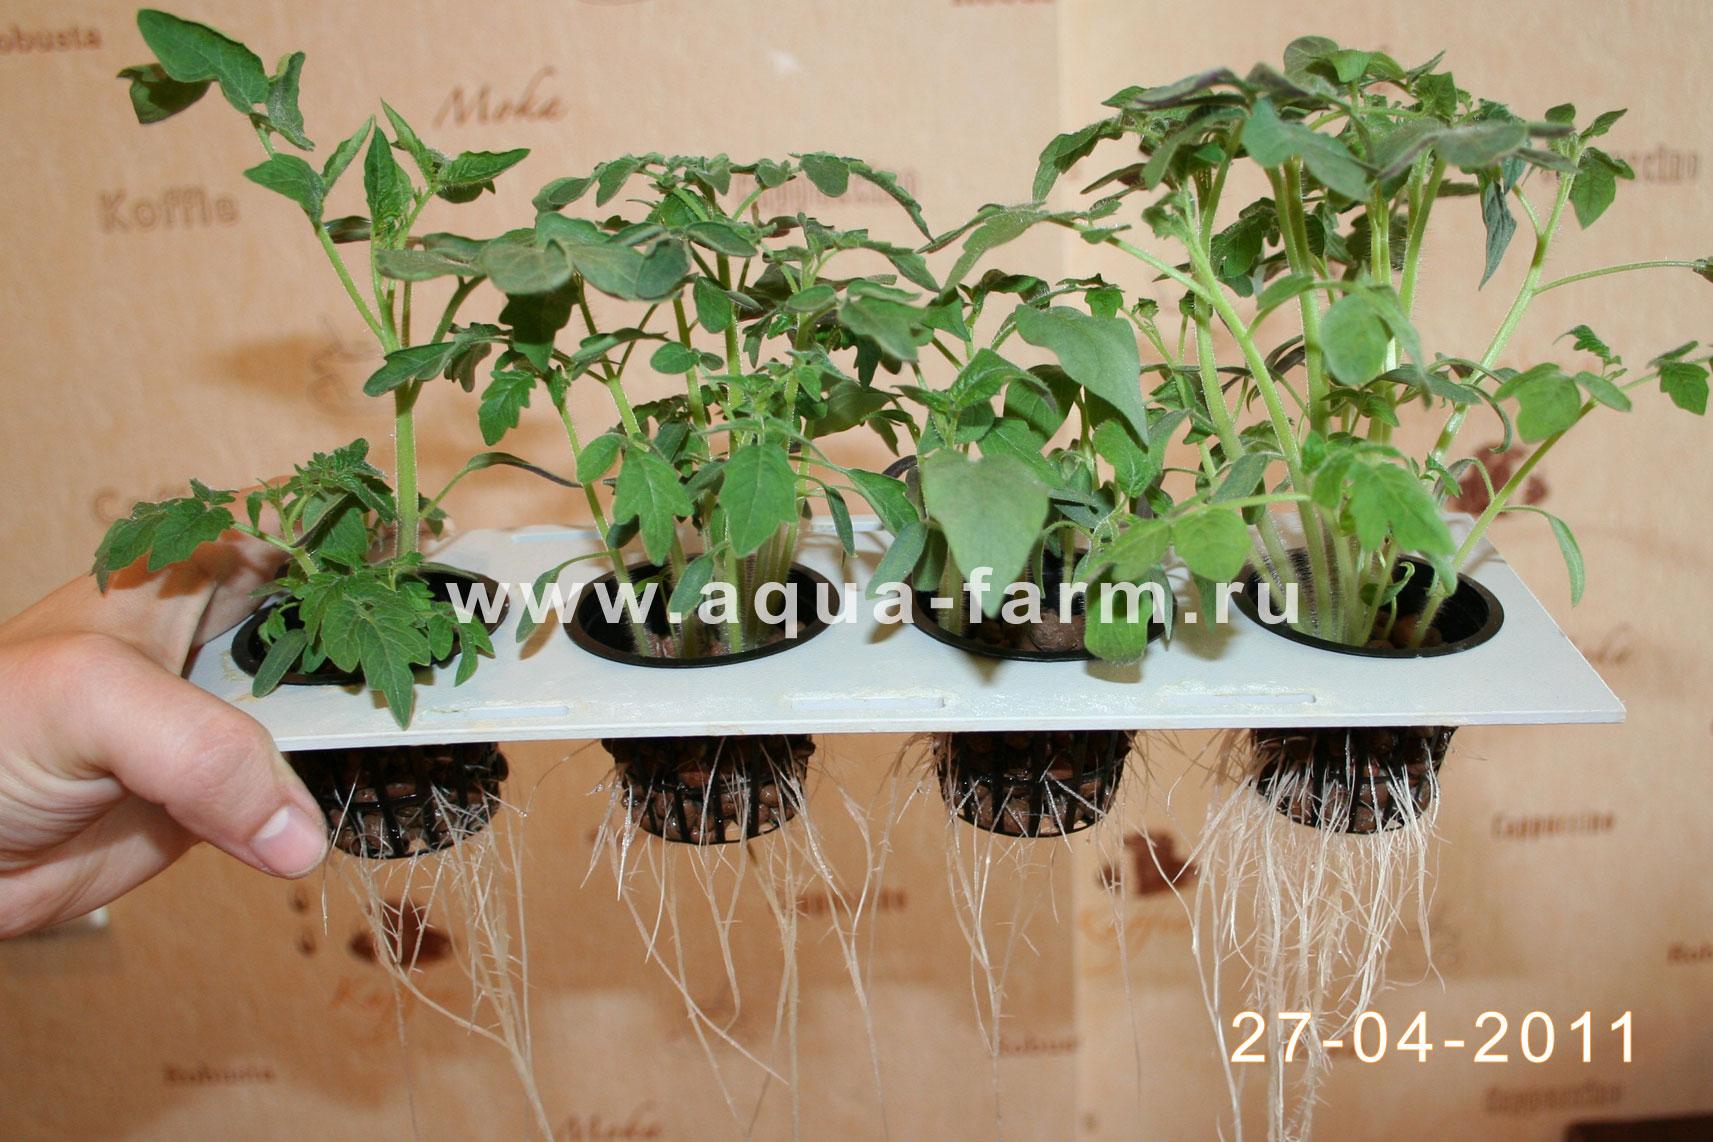 Рассада помидор в домашних условиях 85